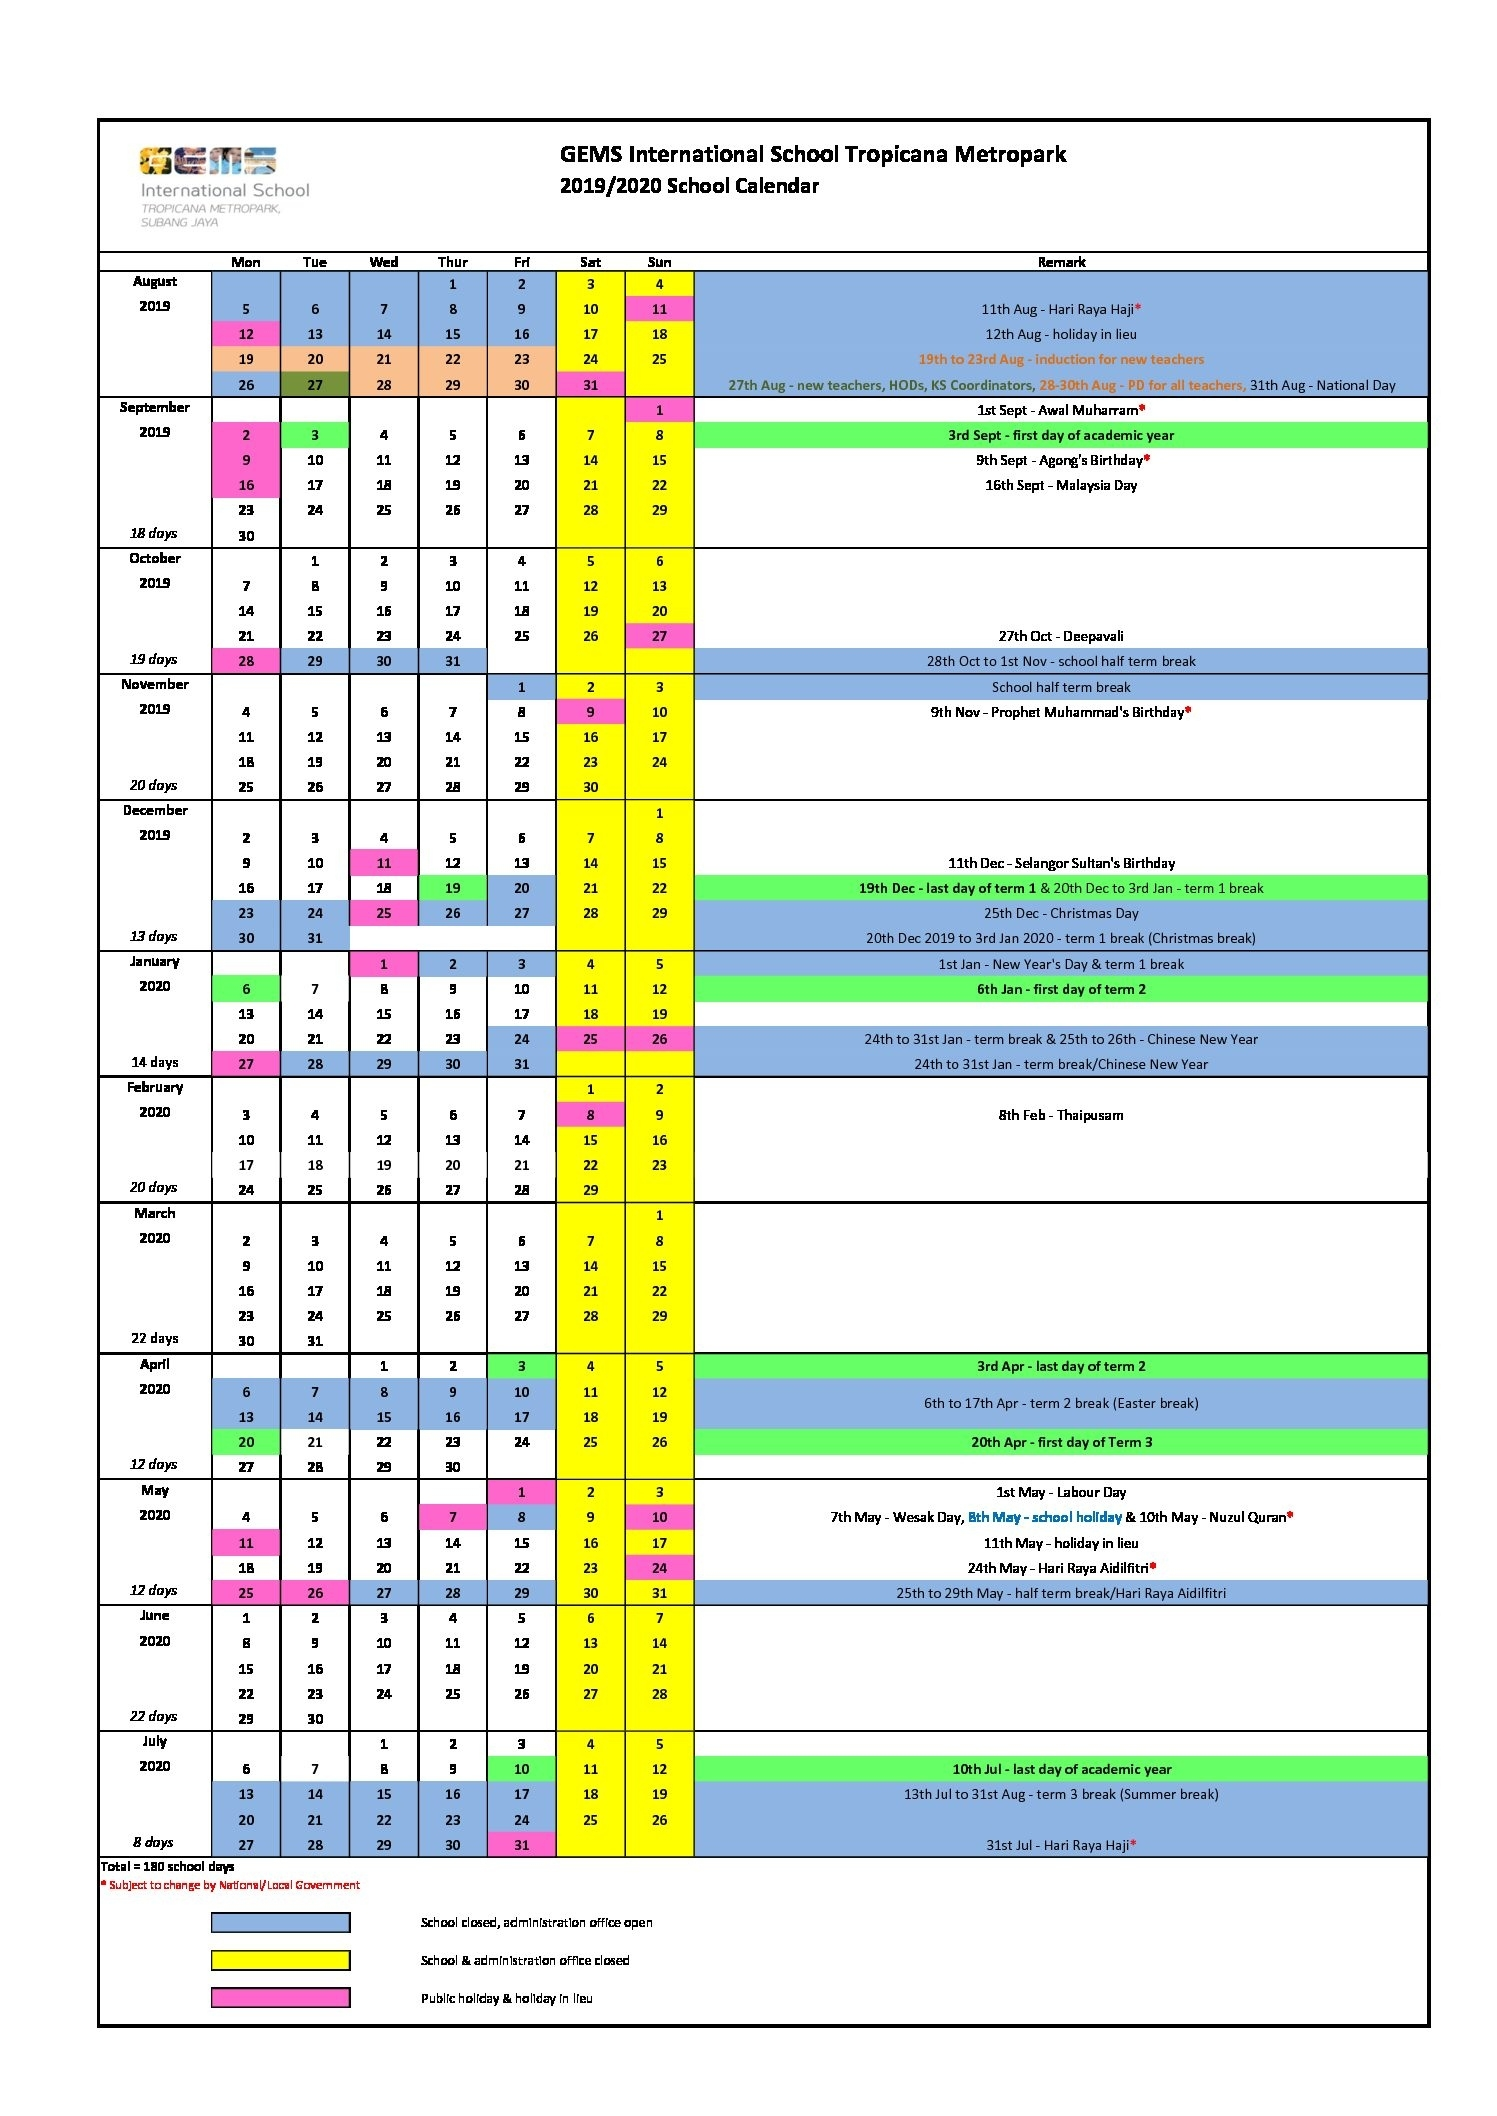 2019/2020 School Calendar - Gems International School Metropark Extraordinary Malaysia School Academic Calendar 2020